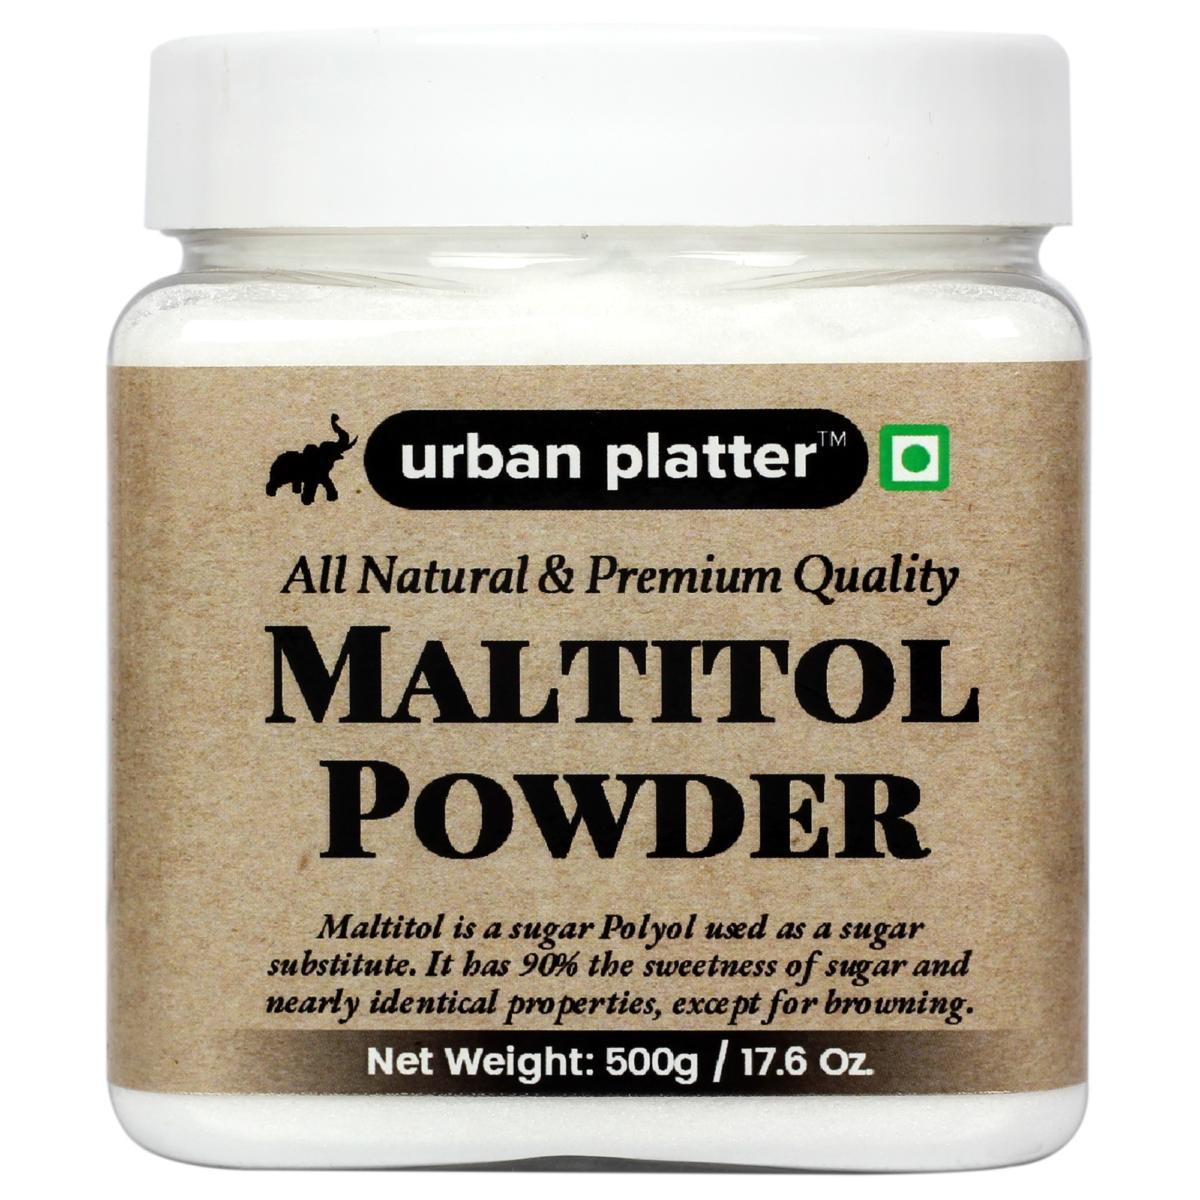 Urban Platter Maltitol Powder, 500g / 17.5oz [All Natural, Premium Quality, Sweetener]